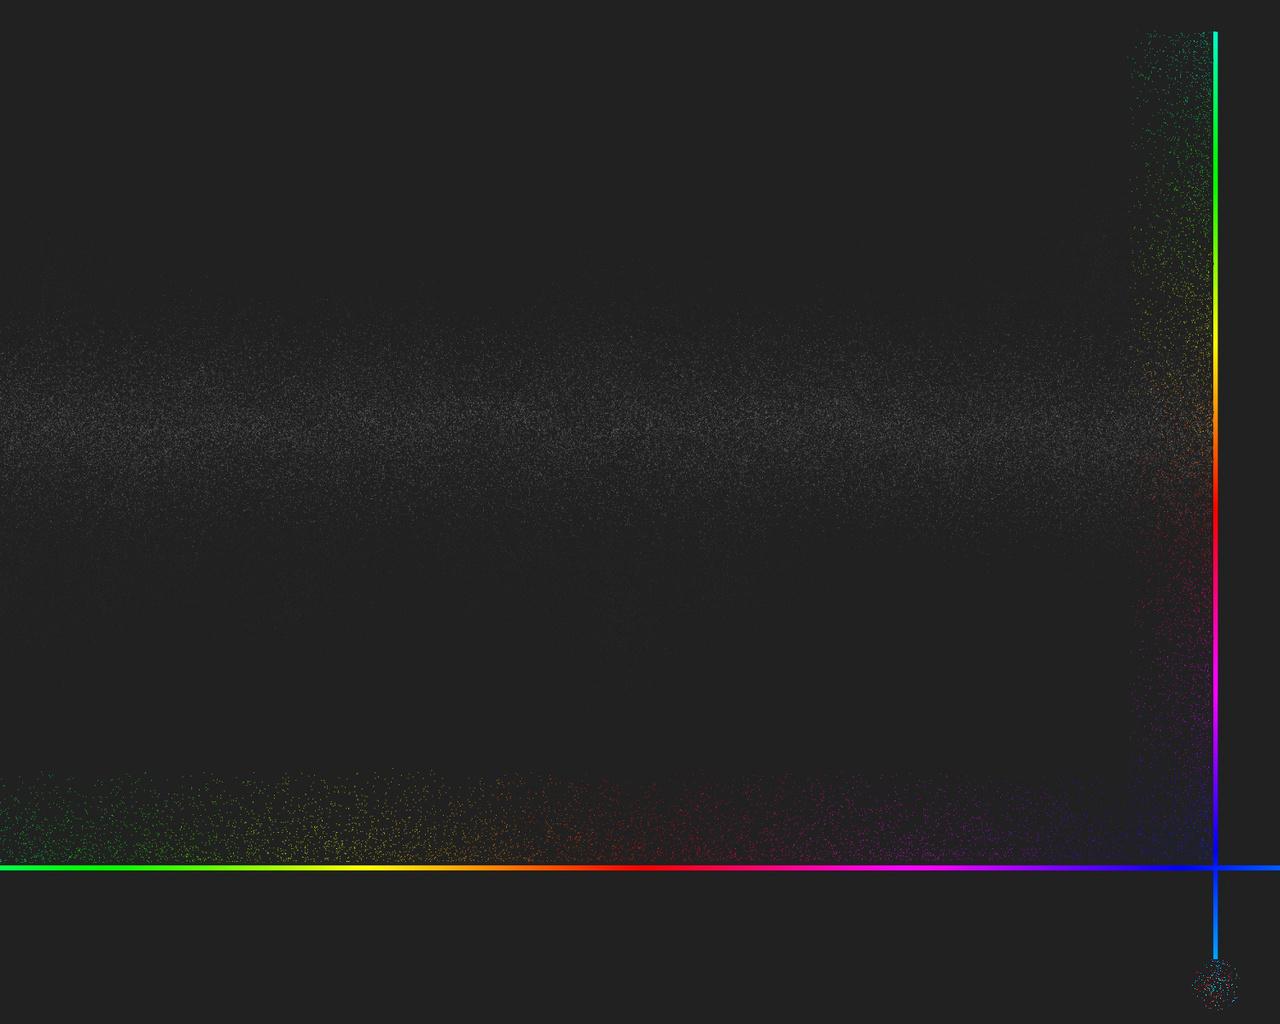 заставка, фон, темный, линии, цвета